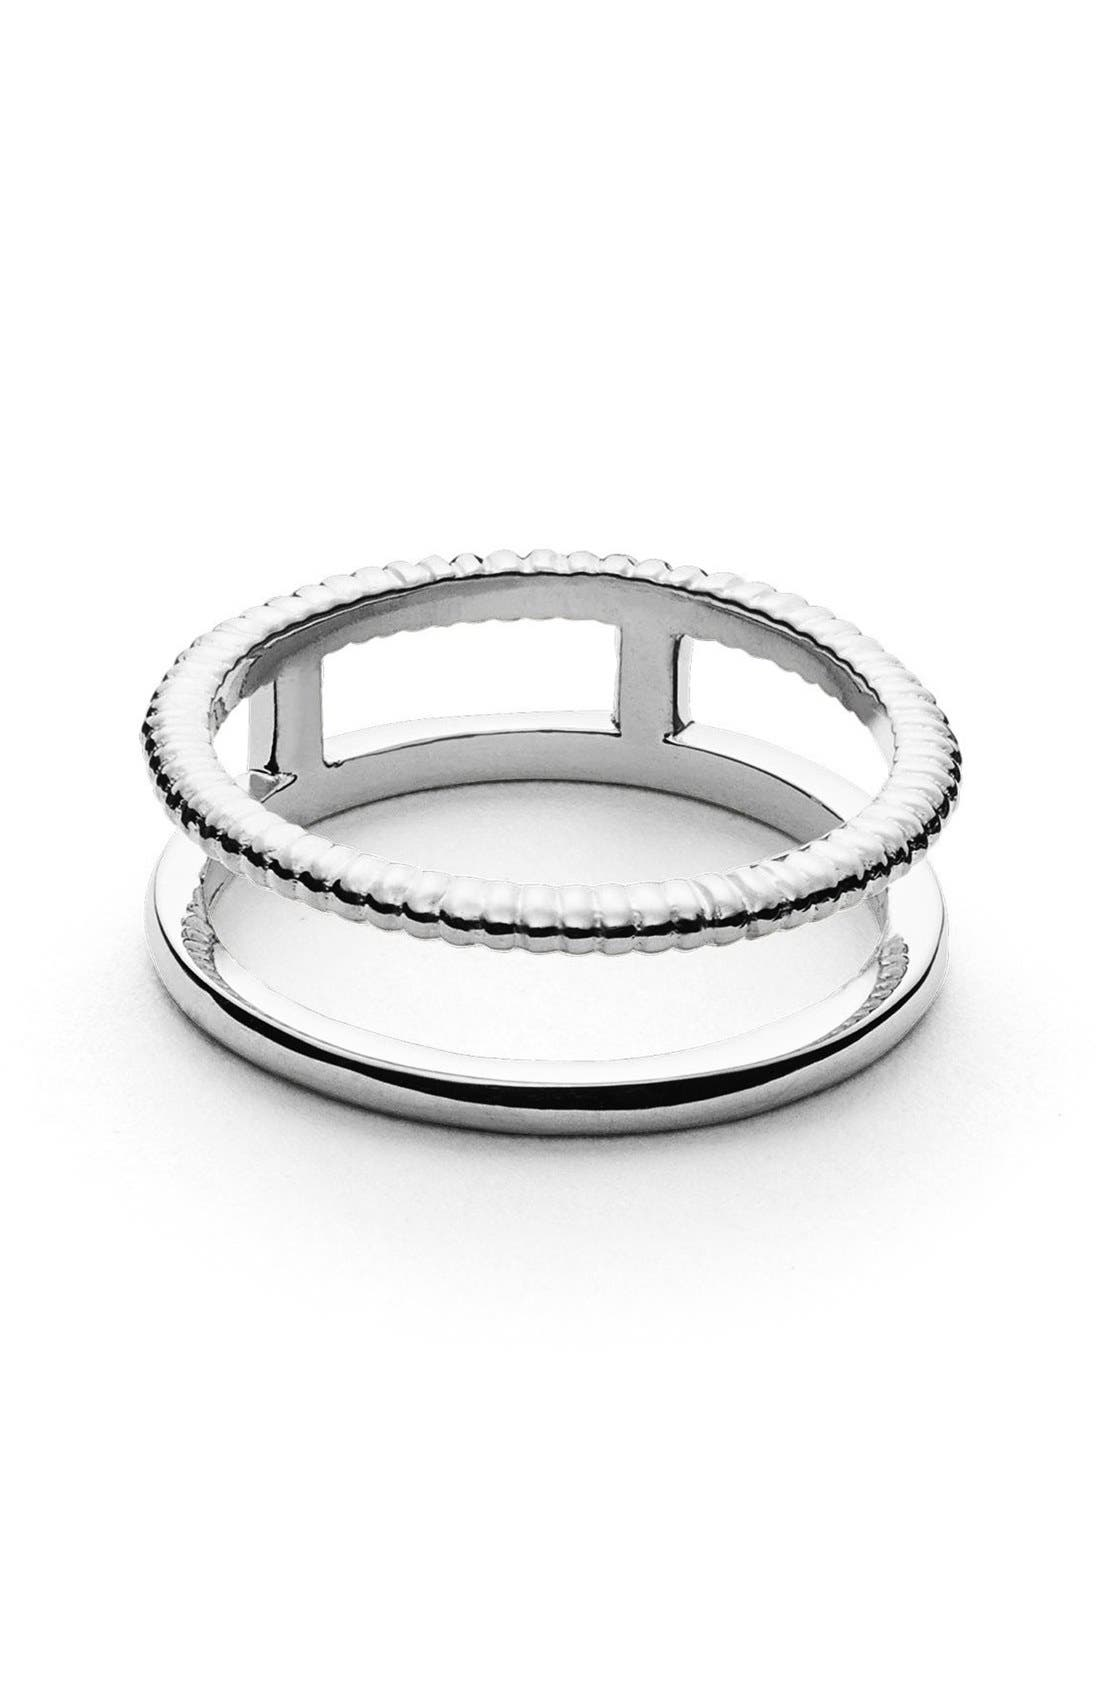 Coin Edge Ring,                             Main thumbnail 1, color,                             040